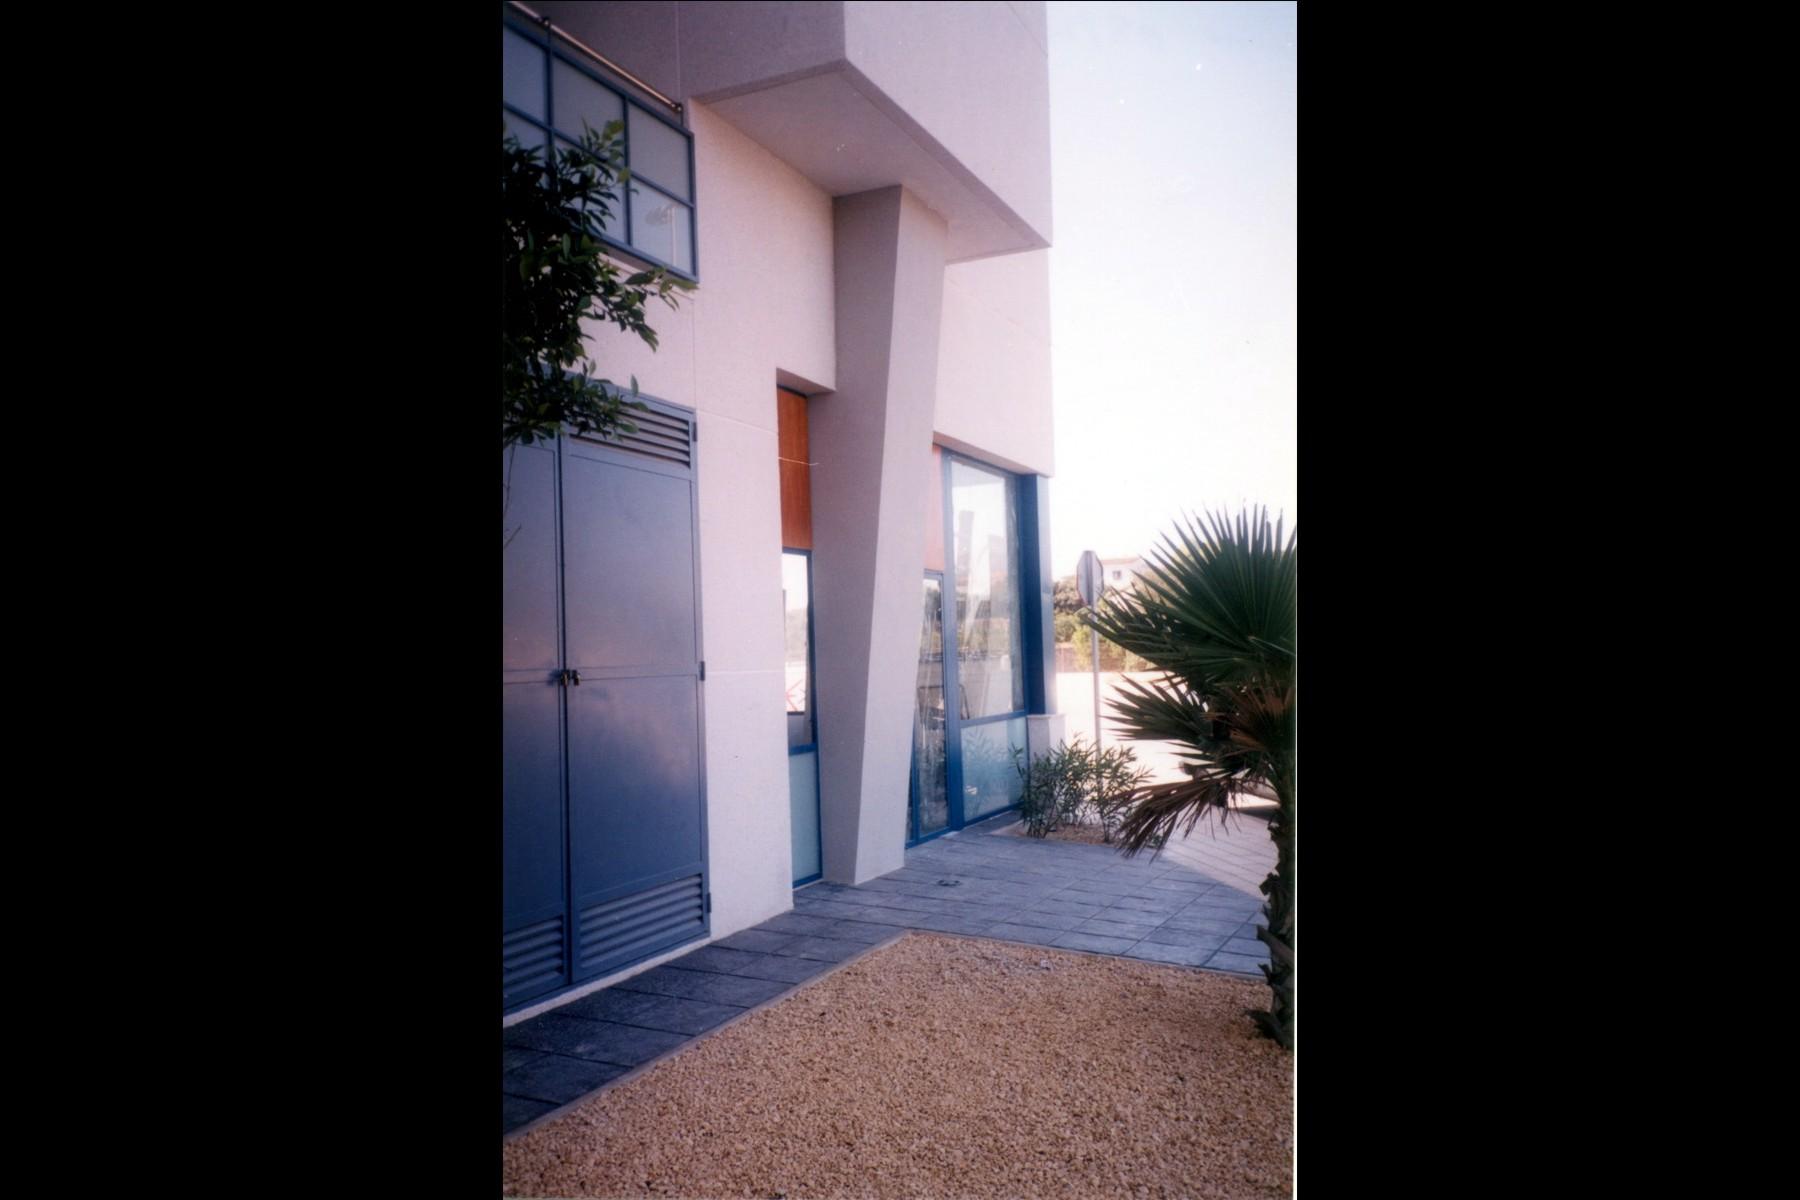 Imaginarq-053-Edificio-Viviendas-Altea-Alicante-18A